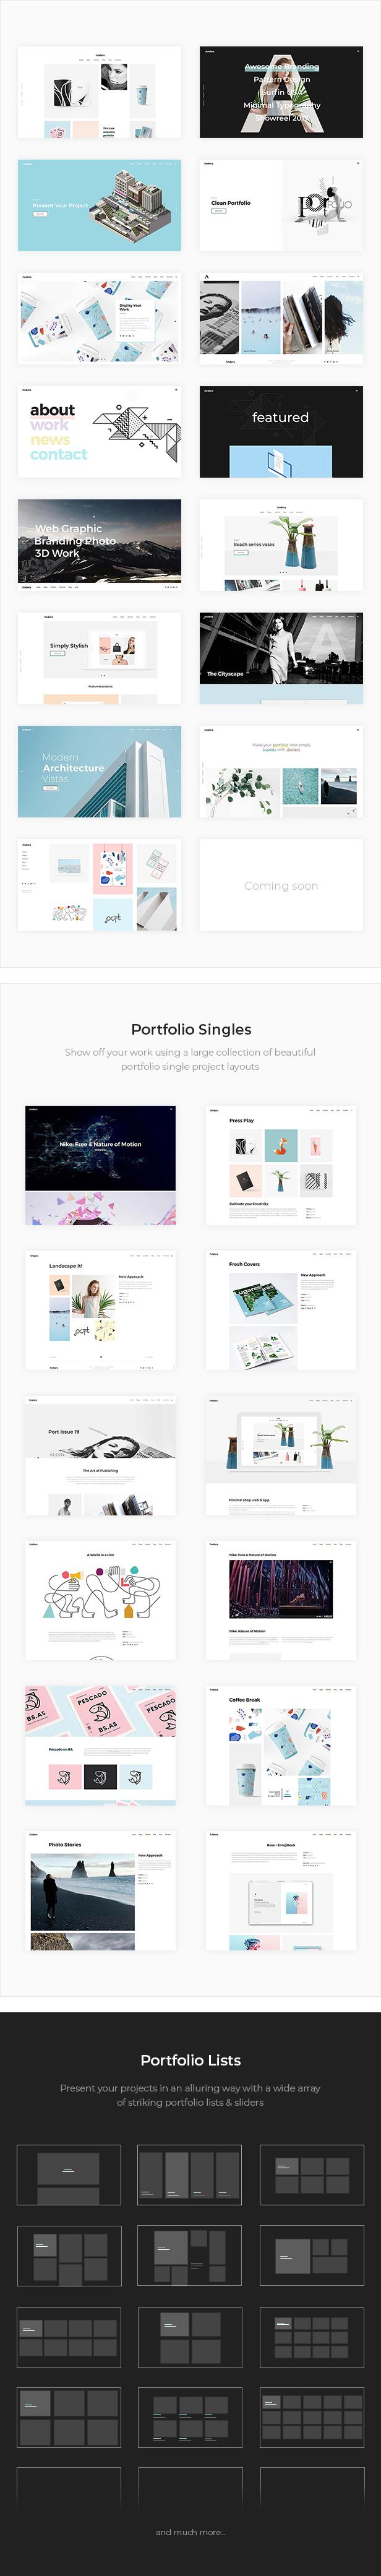 Anders - Design Portfolio Theme - 2